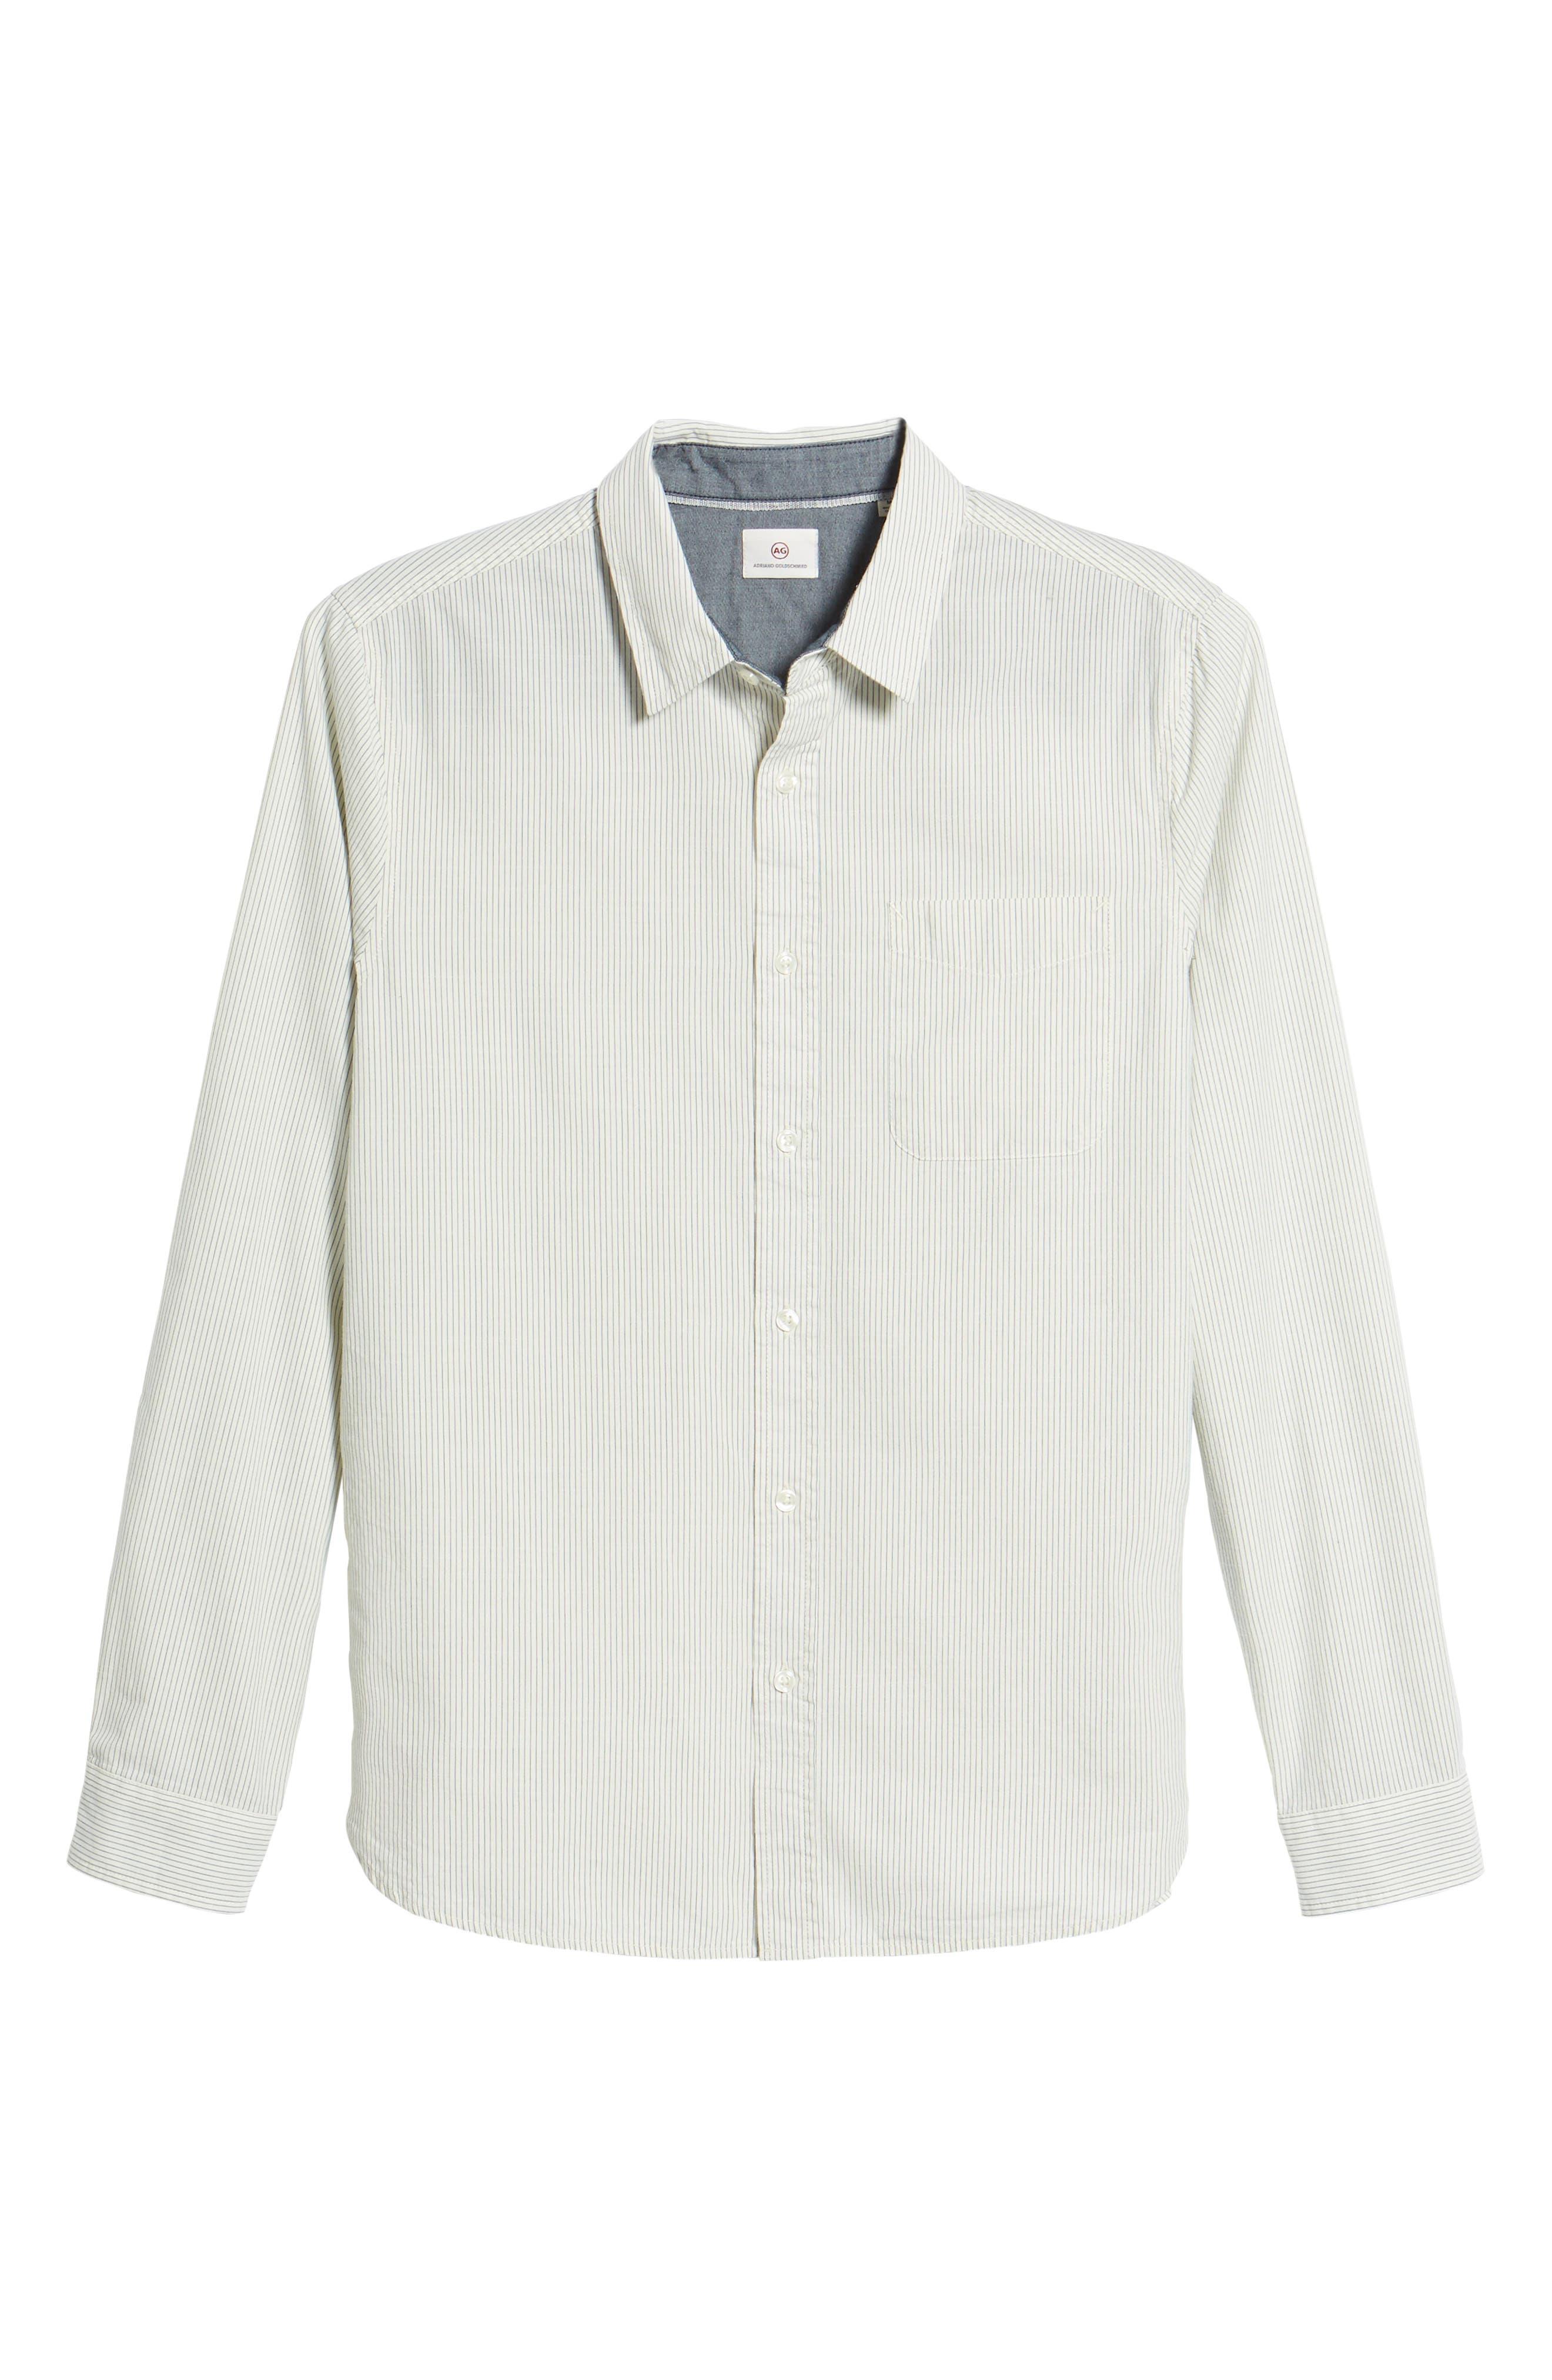 Colton Regular Fit Stripe Sport Shirt,                             Alternate thumbnail 6, color,                             171